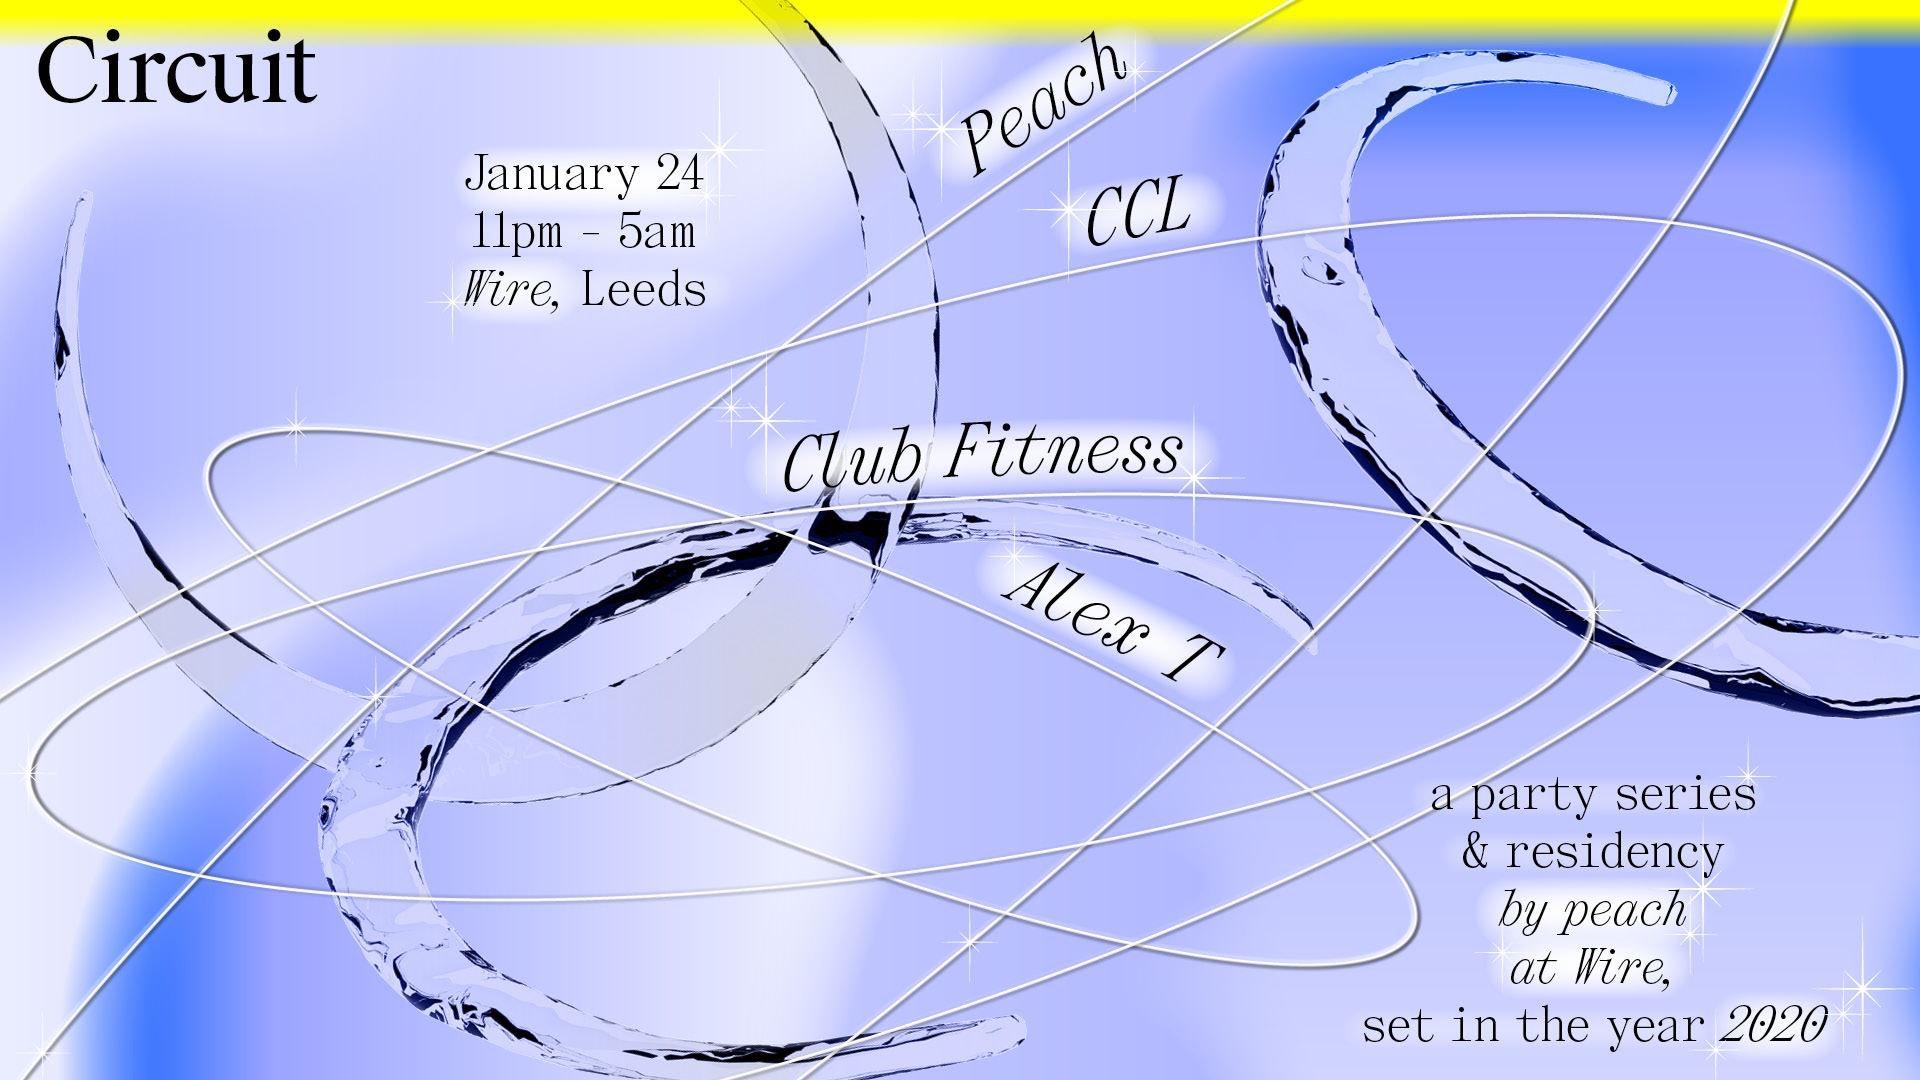 Circuit: Peach, CCL, Club Fitness & Alex T